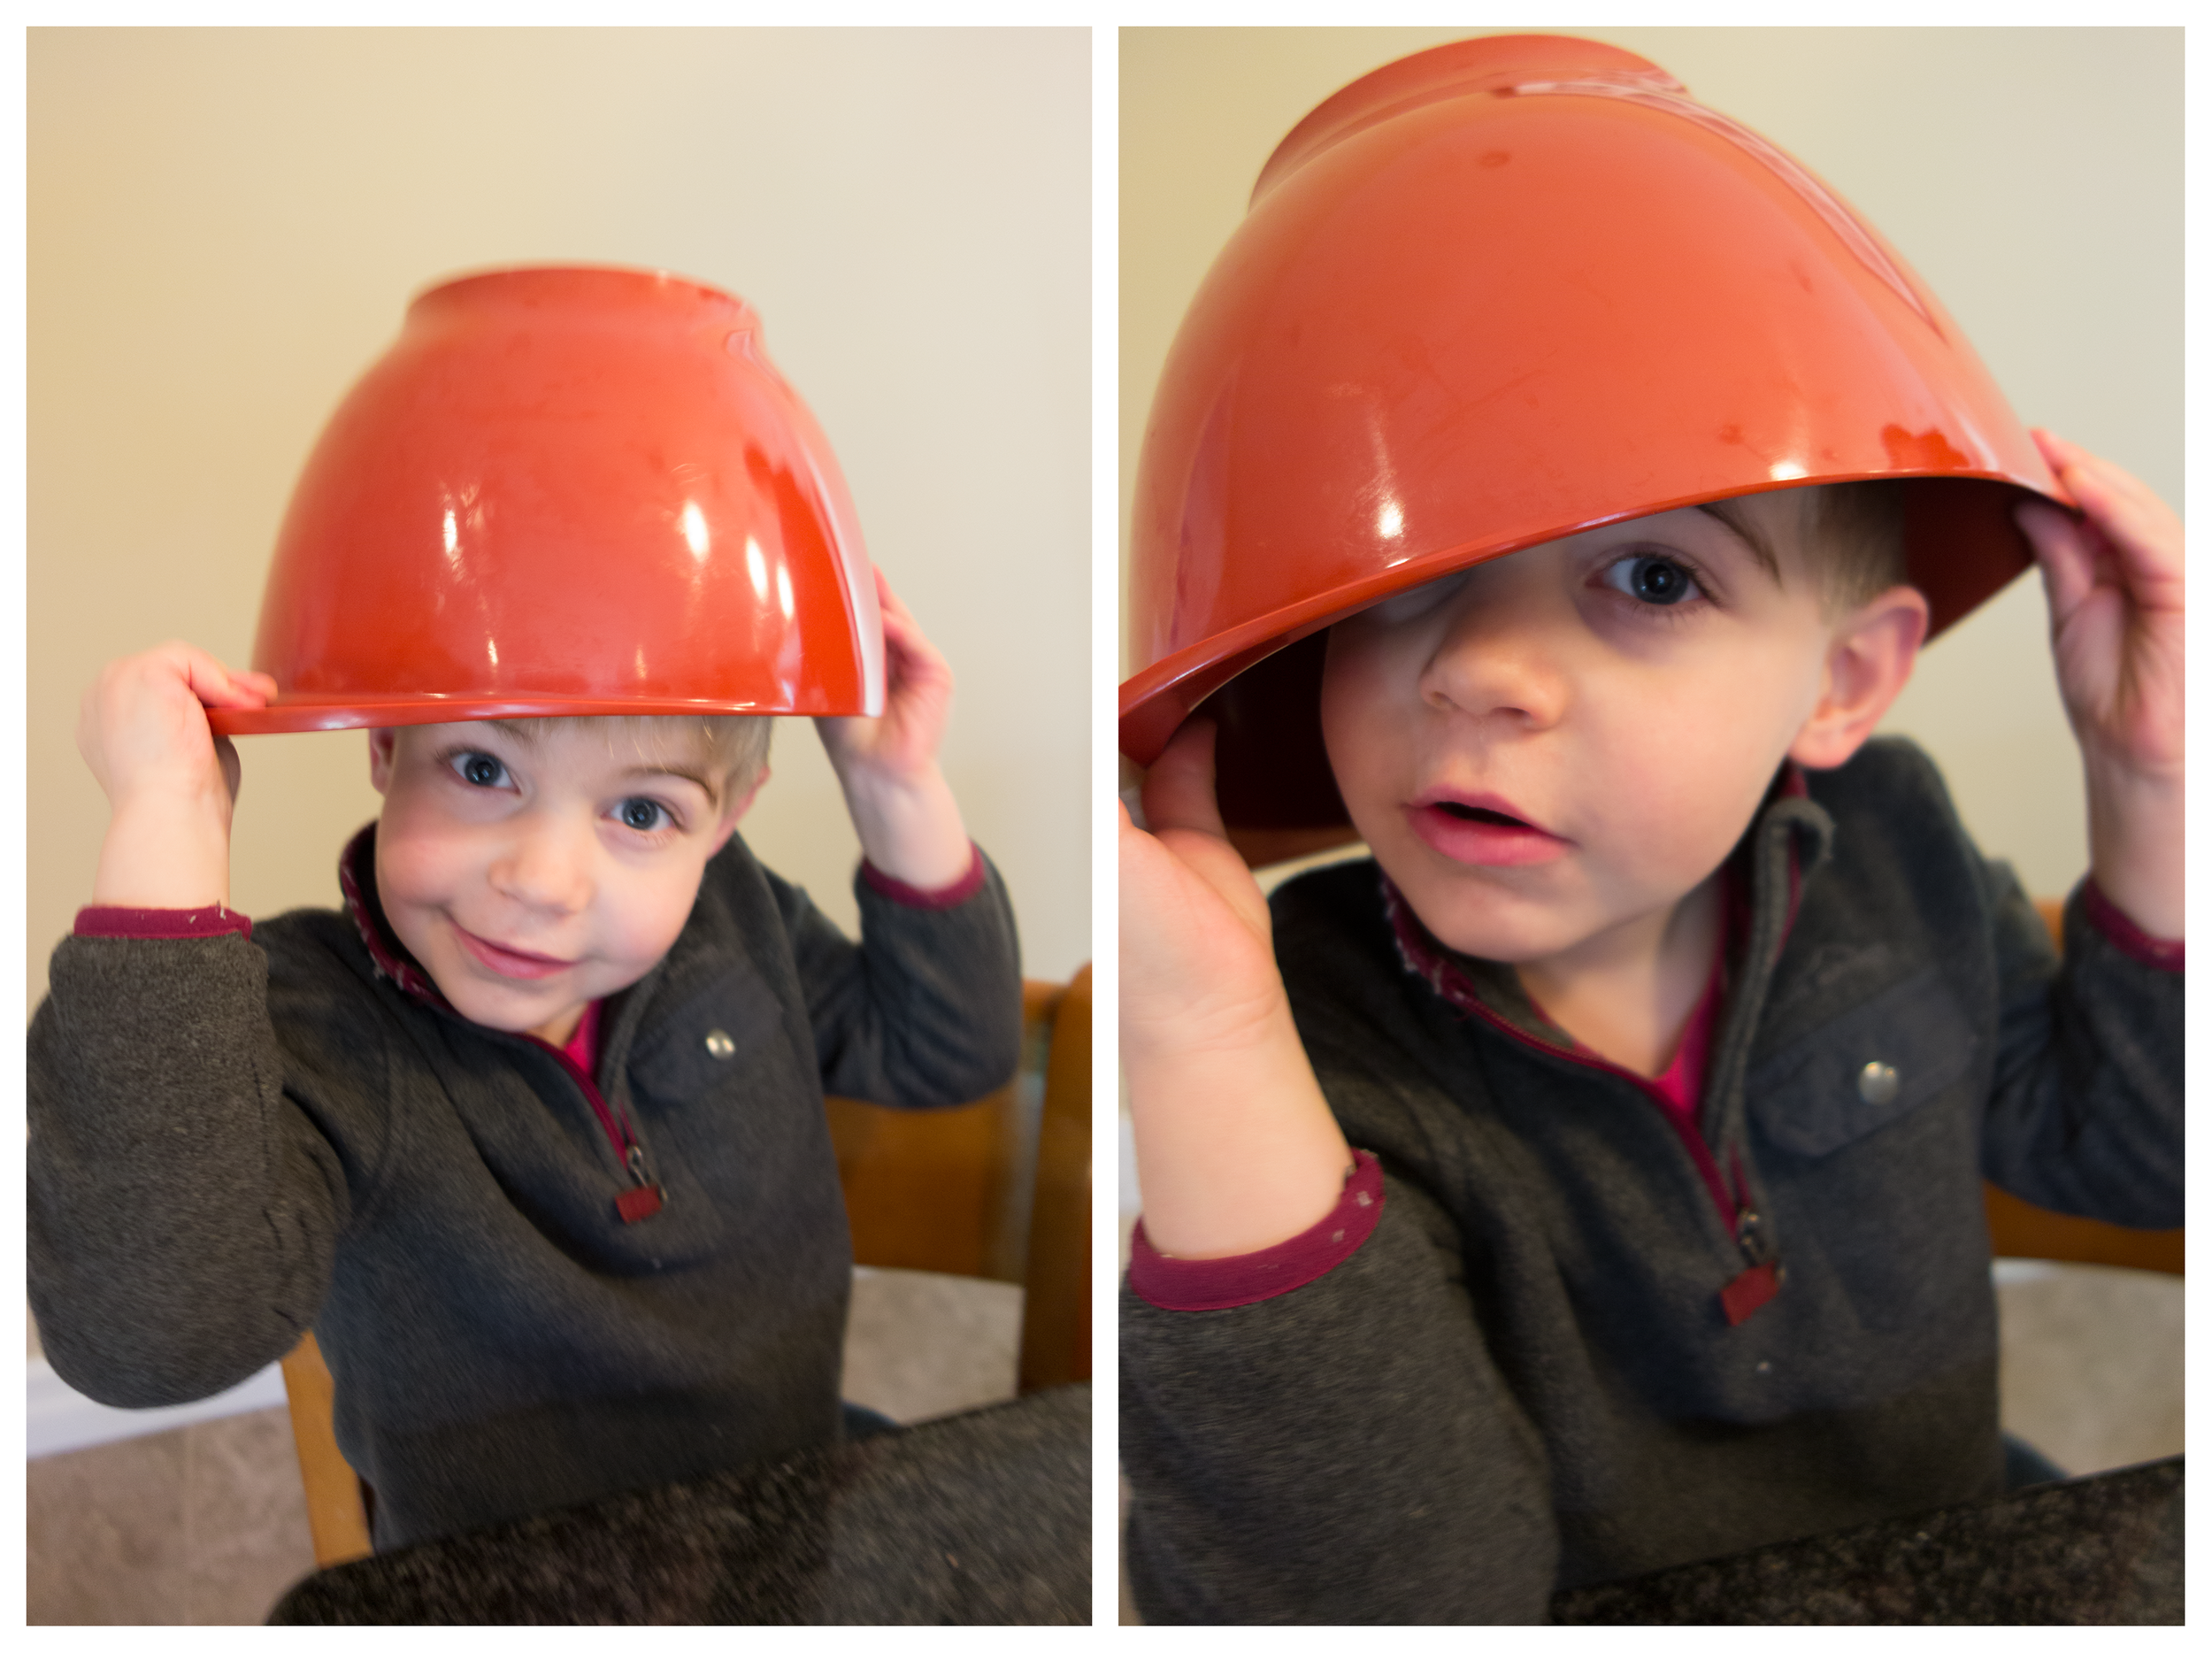 My adorable nephew sous-chef